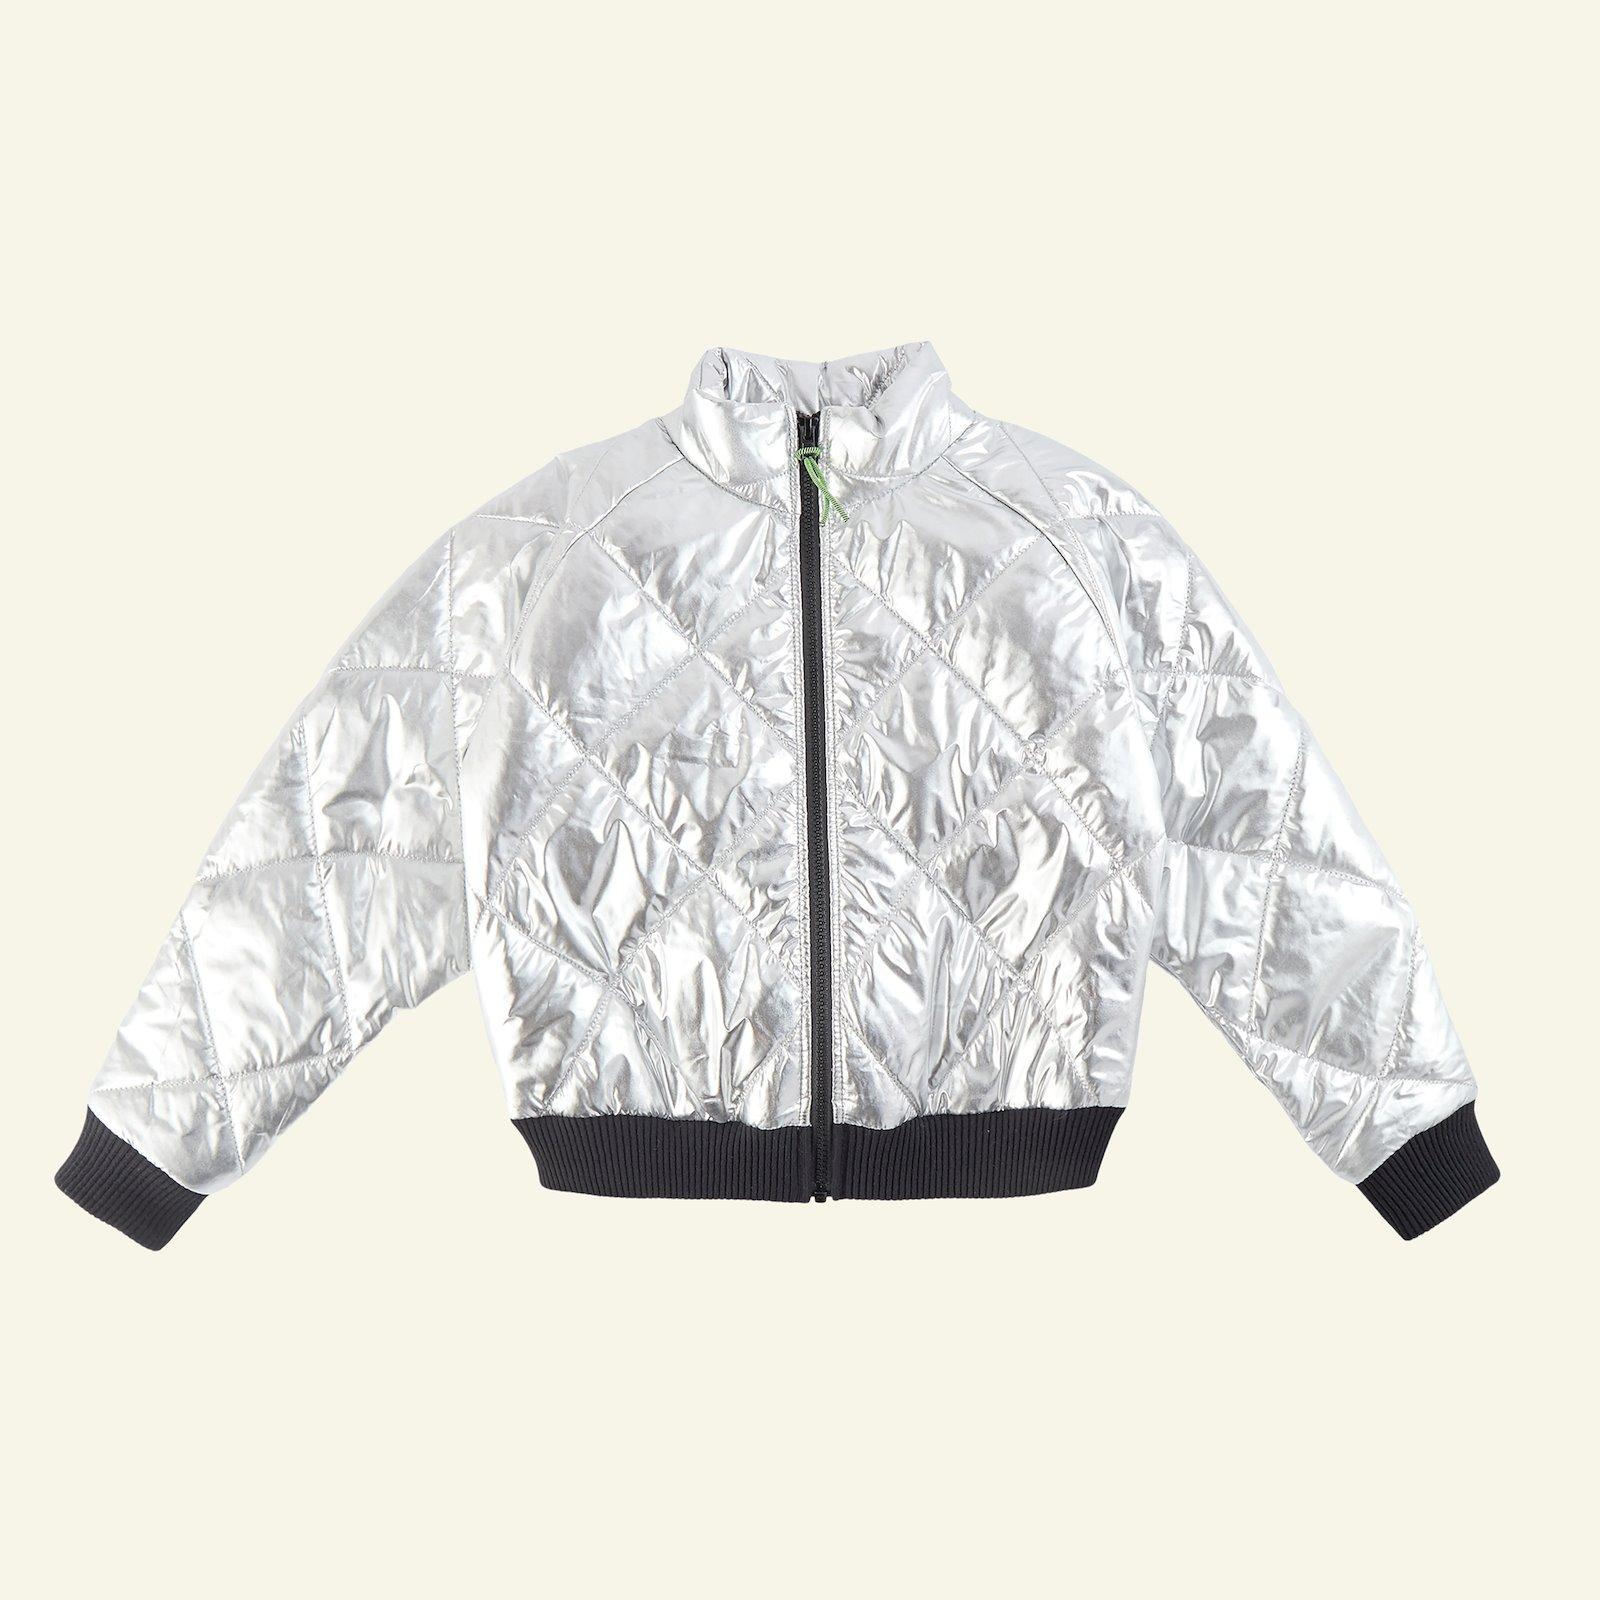 Anorak and jacket, 140/10y p64020_920222_96077_3509072_sskit